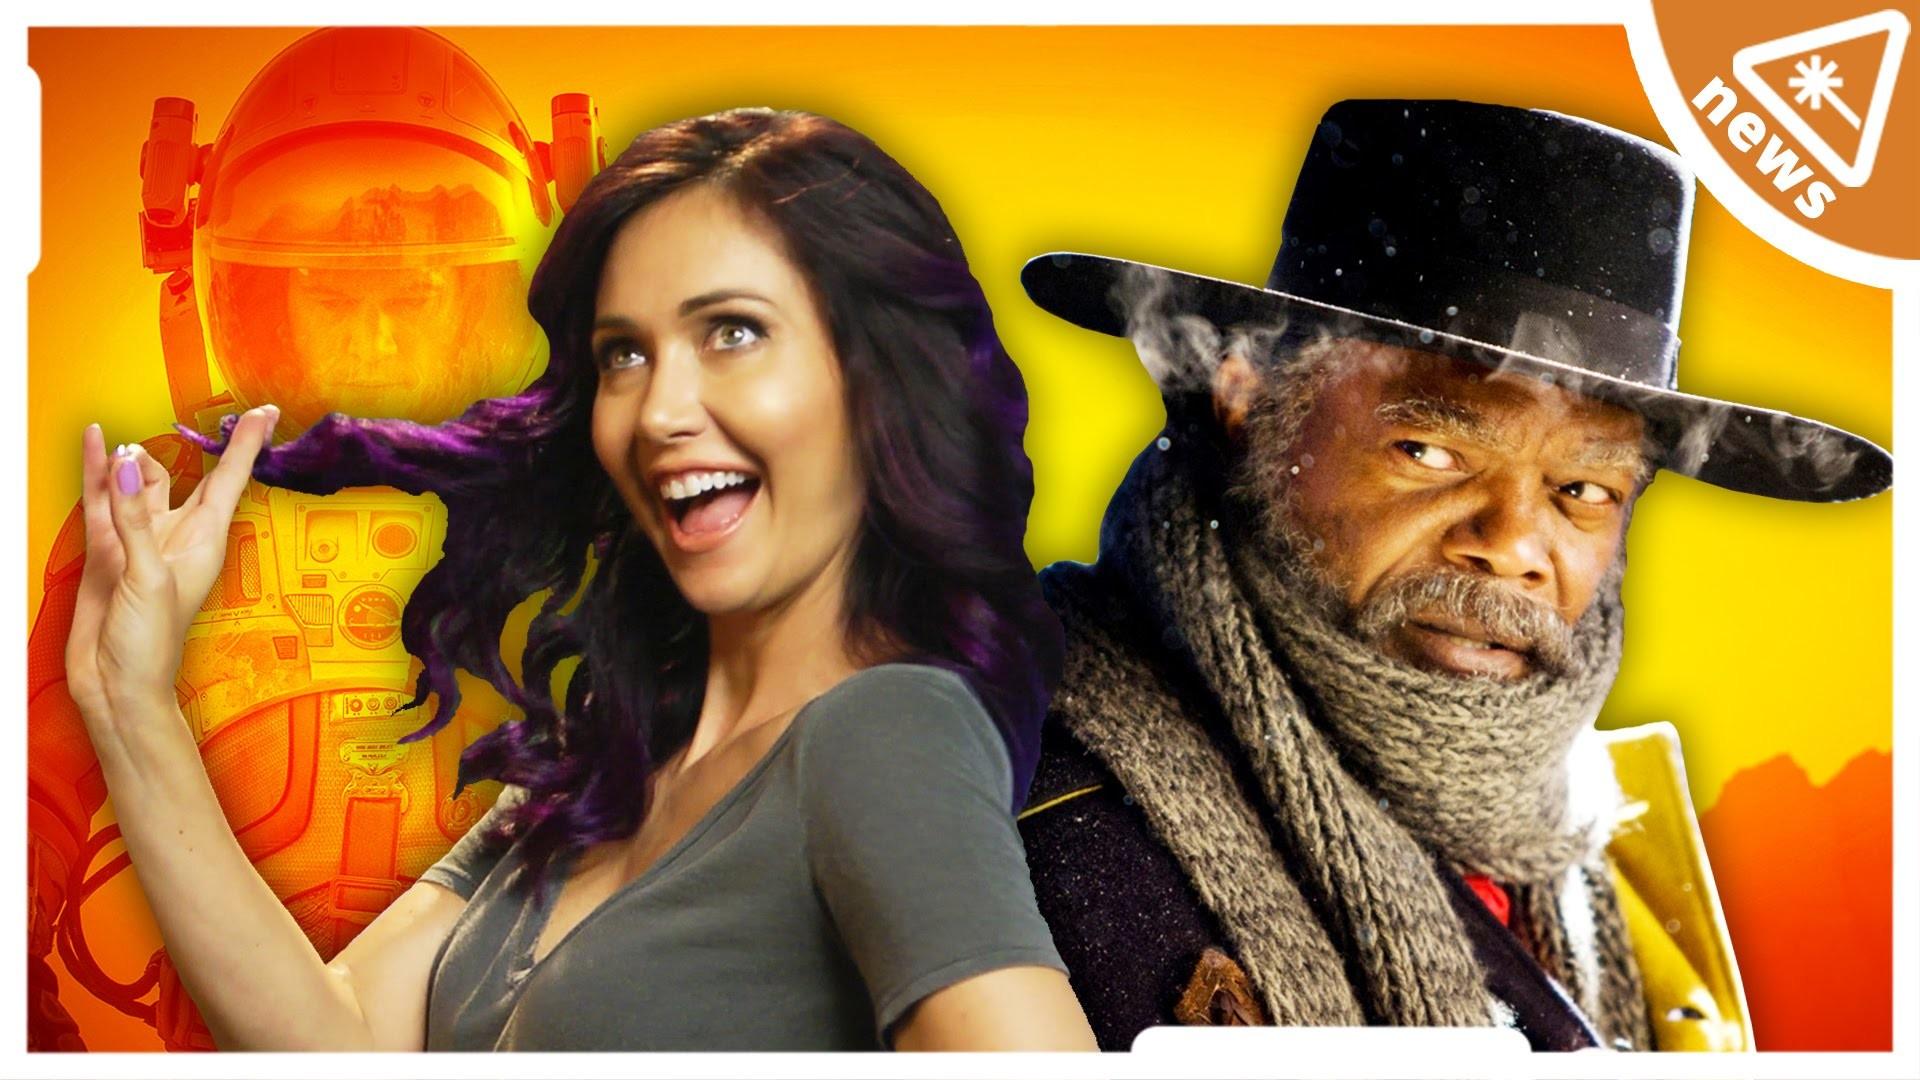 Top 7 Upcoming Non-STAR WARS Geek Movies! (Nerdist News w/ Jessica Chobot)  – YouTube